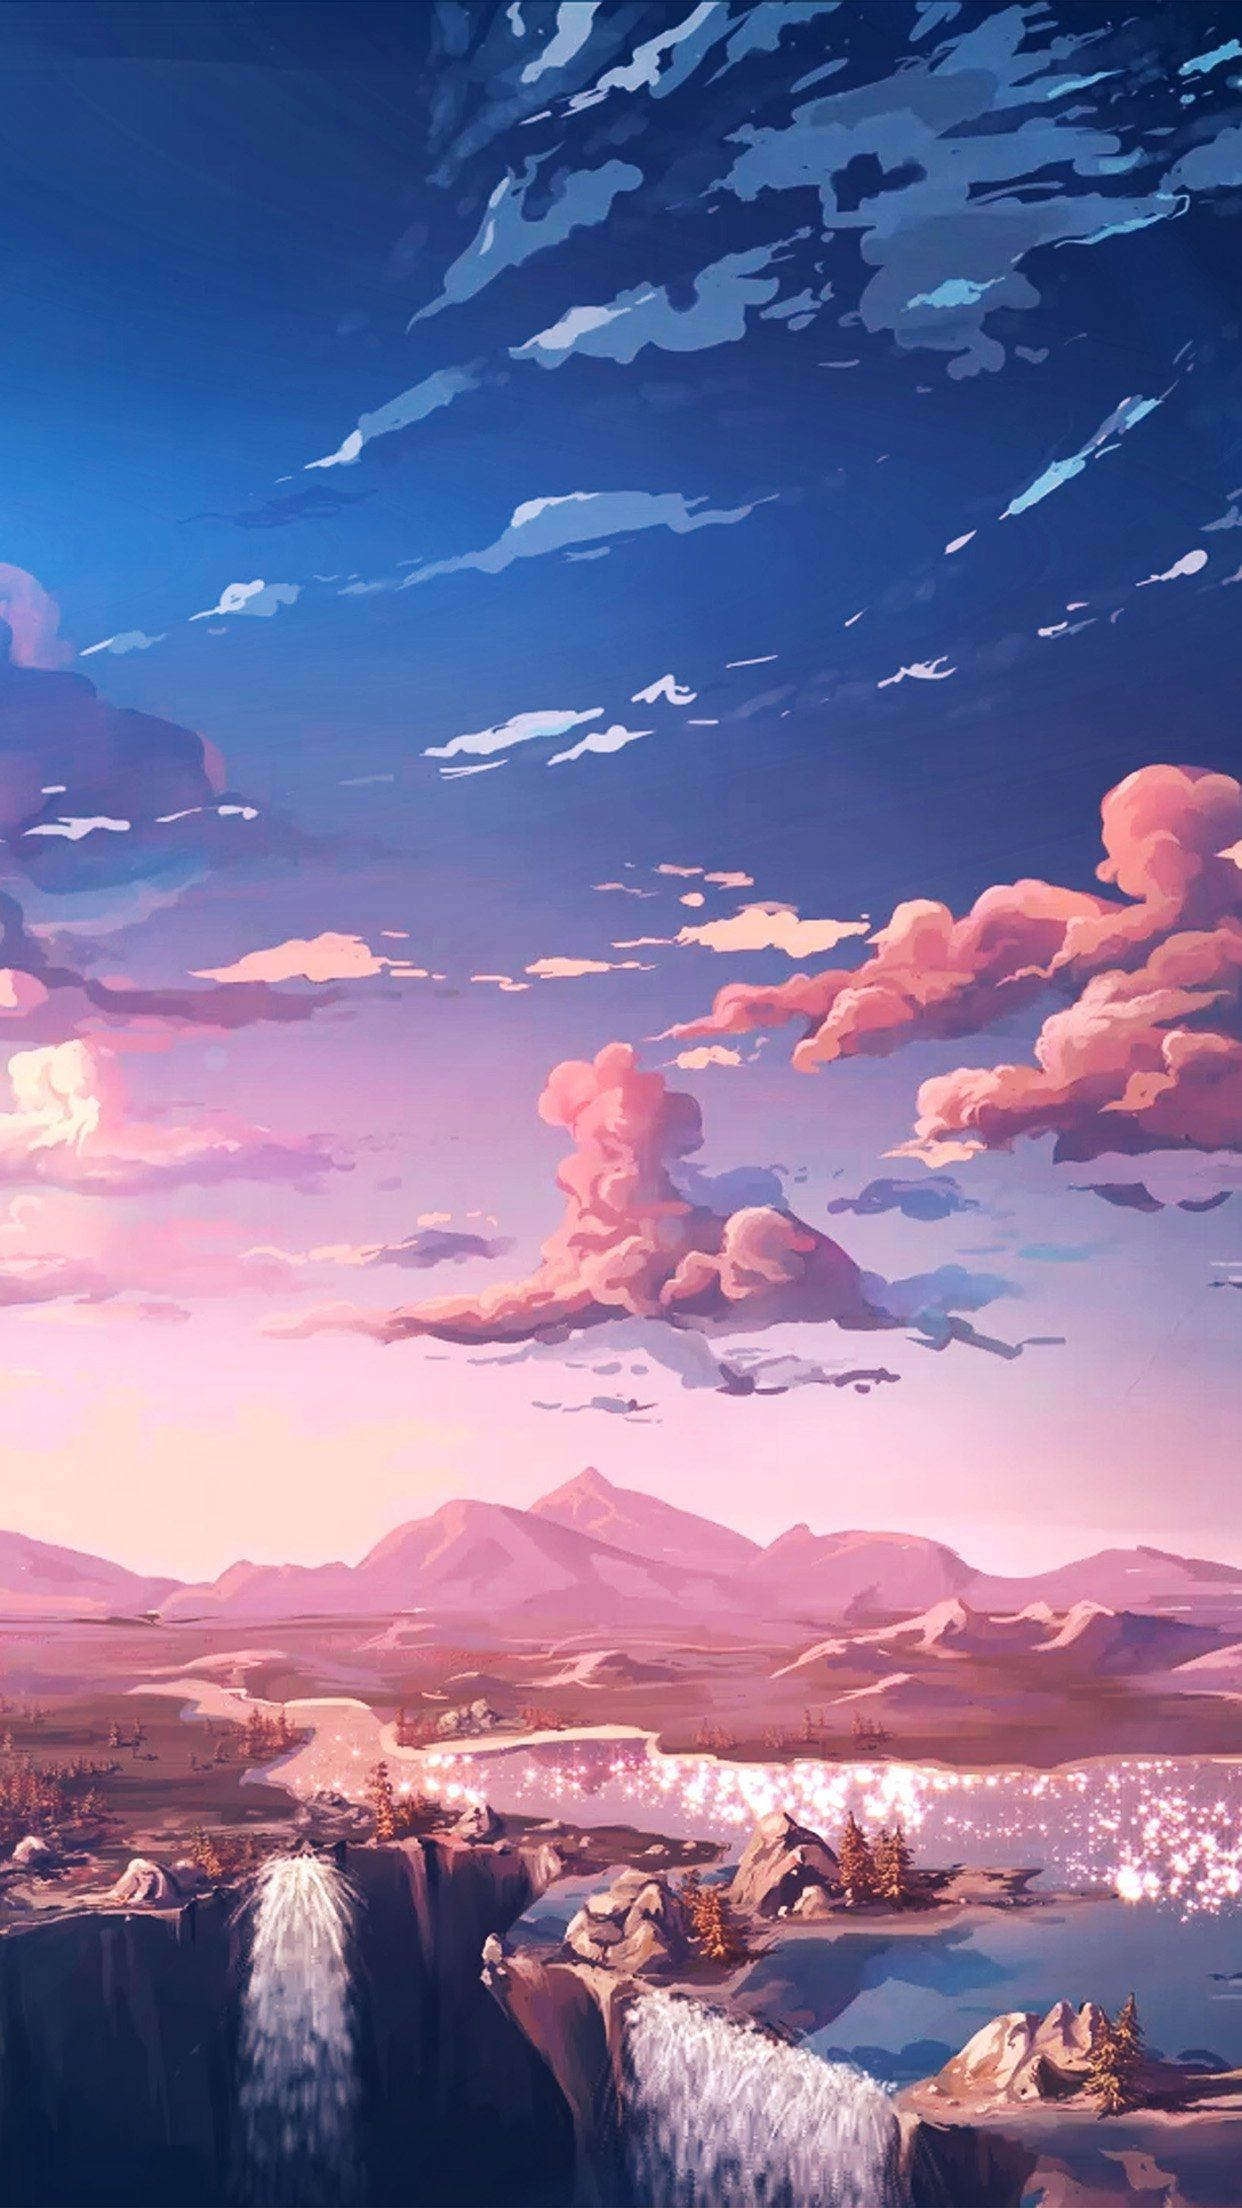 1242x2208 Elegant Cool Anime Iphone Wallpapers Anime Wp Anime Scenery Wallpaper Landscape Wallpaper Scenery Wallpaper